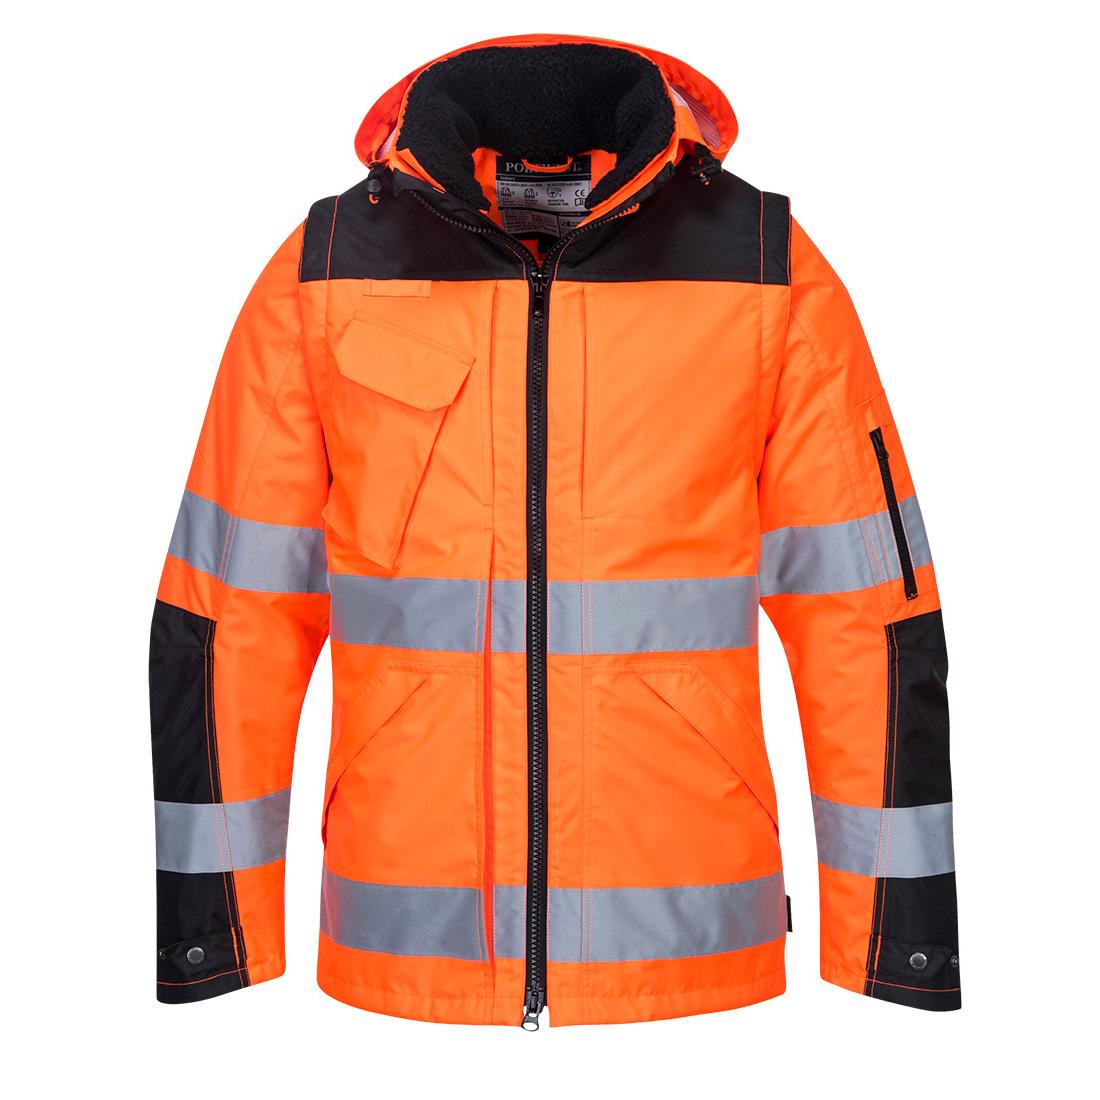 Pro Hi-Vis 3in1 Jacket Orange/Black XXXLR